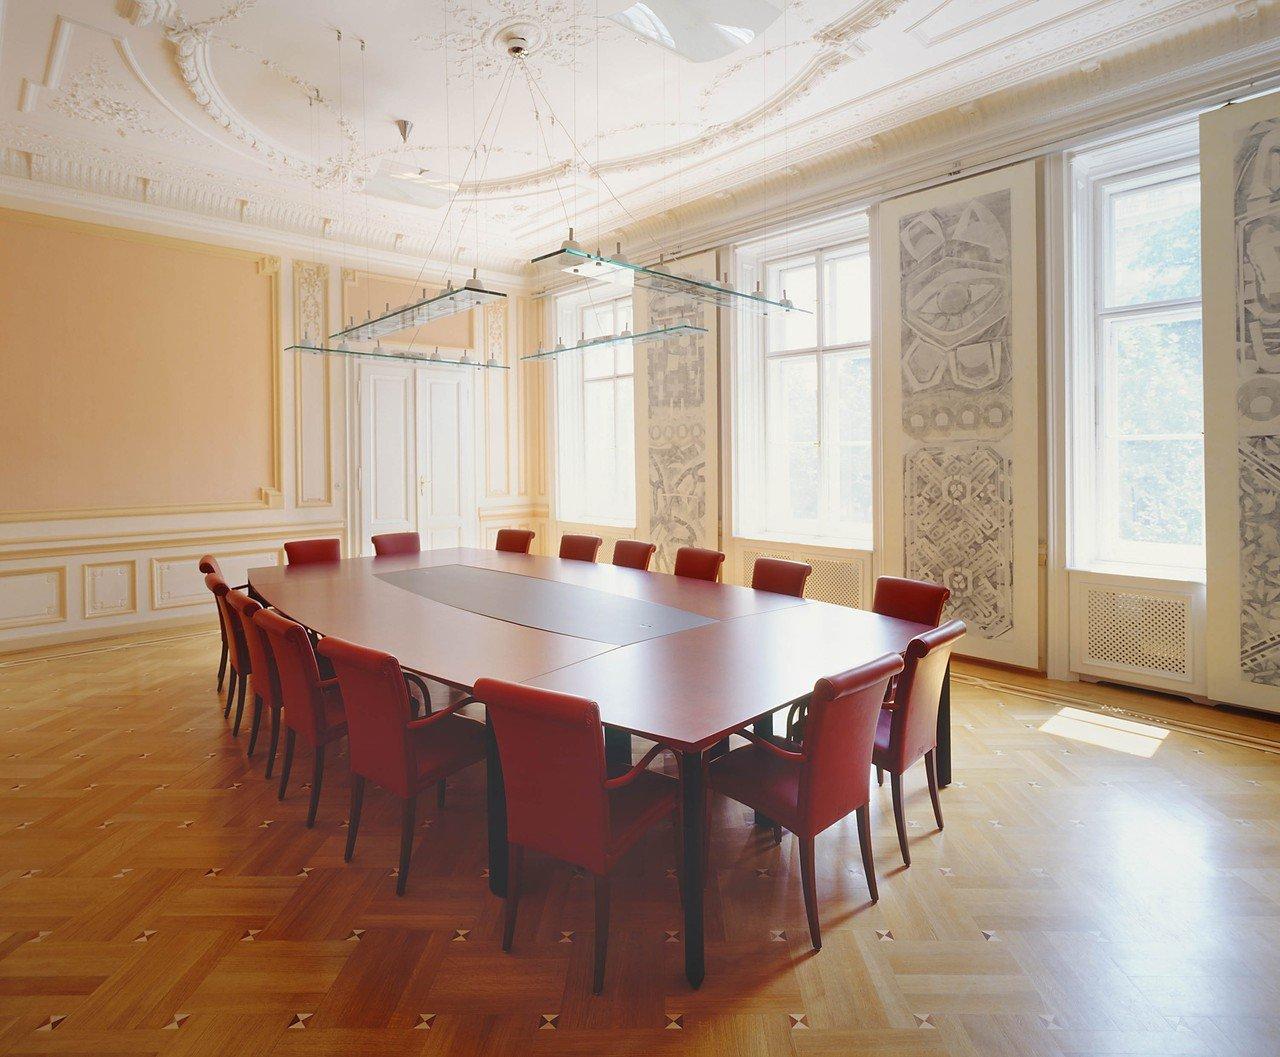 Wien seminar rooms Meetingraum Konferenzzentrum Schubertring  image 0